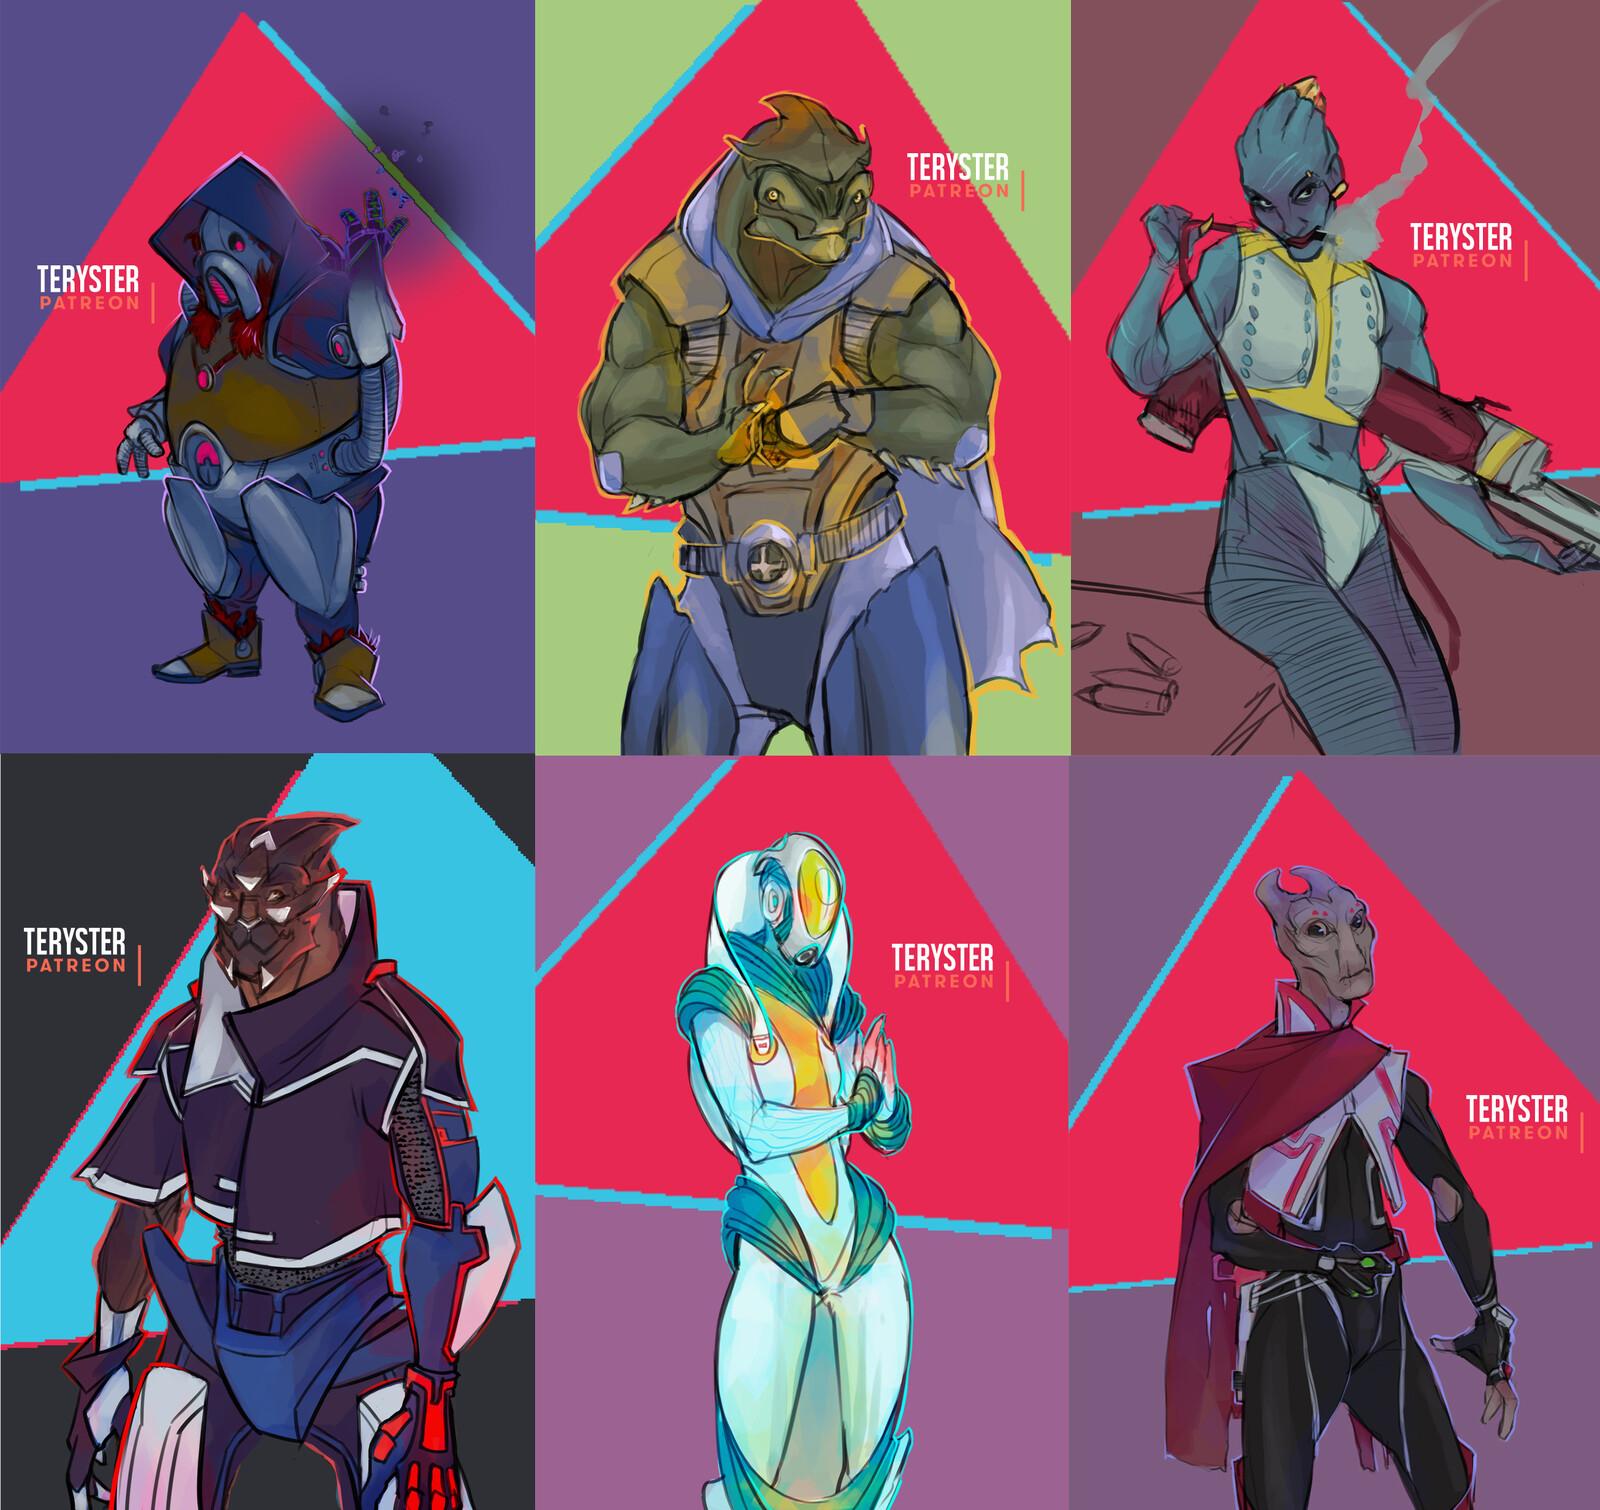 N7 day livestream - random character designs